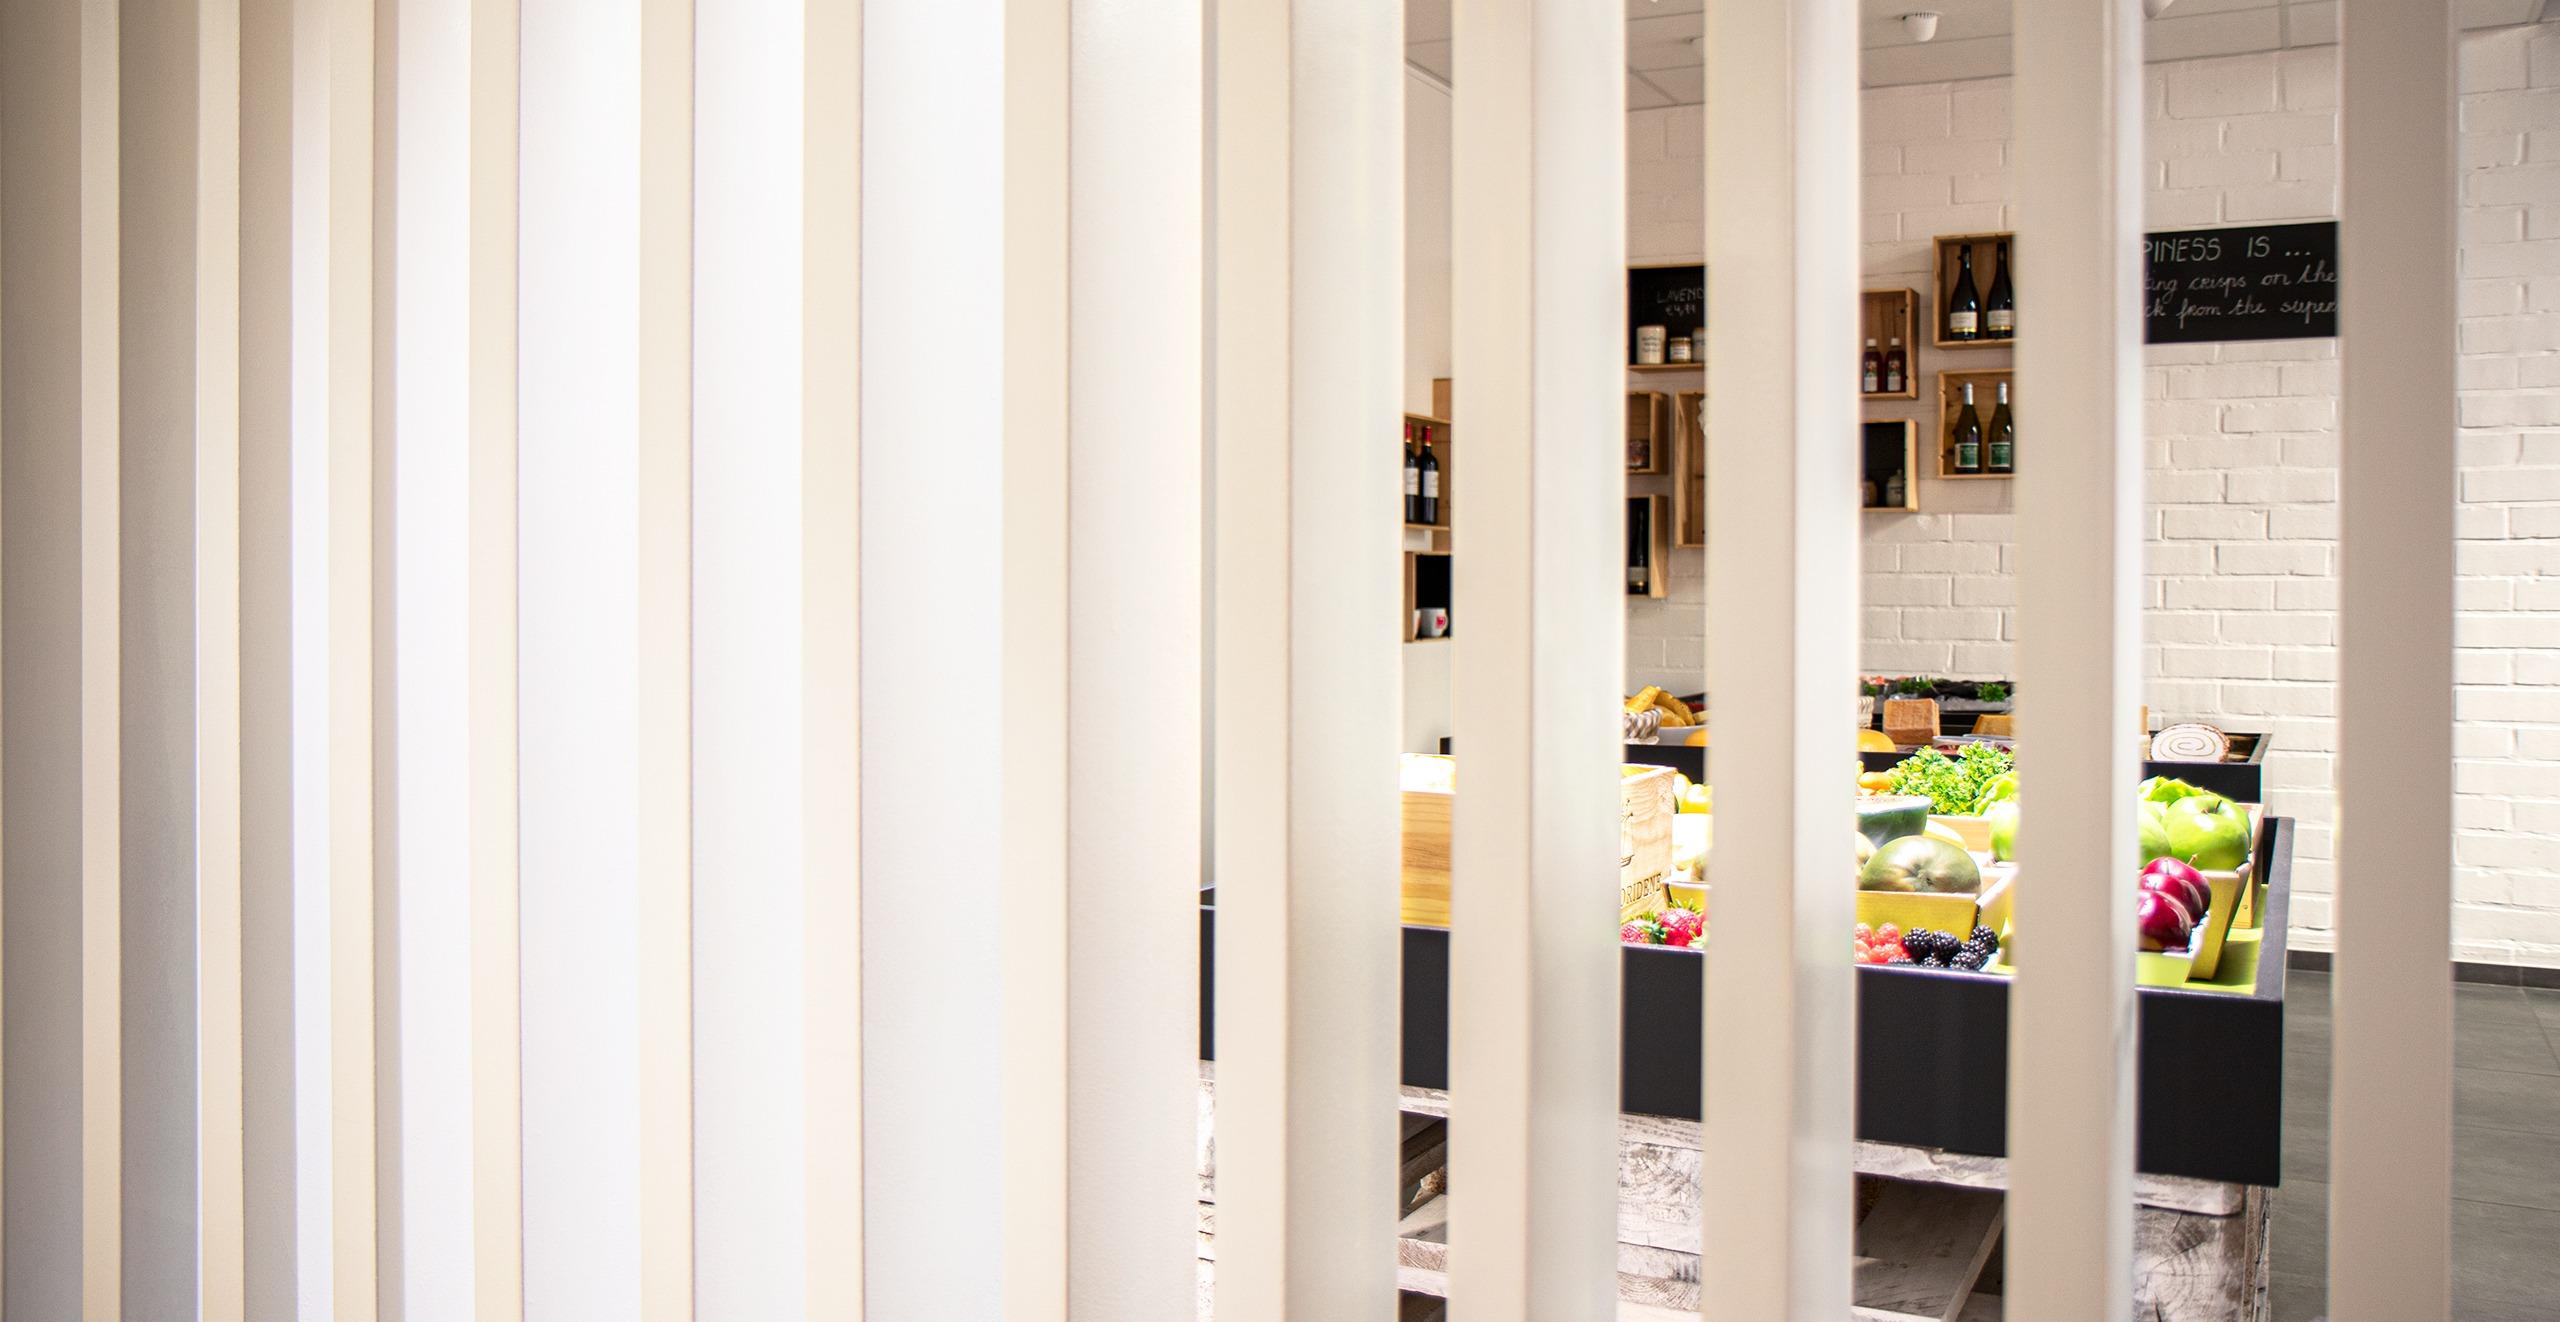 Experience showroom fresh food